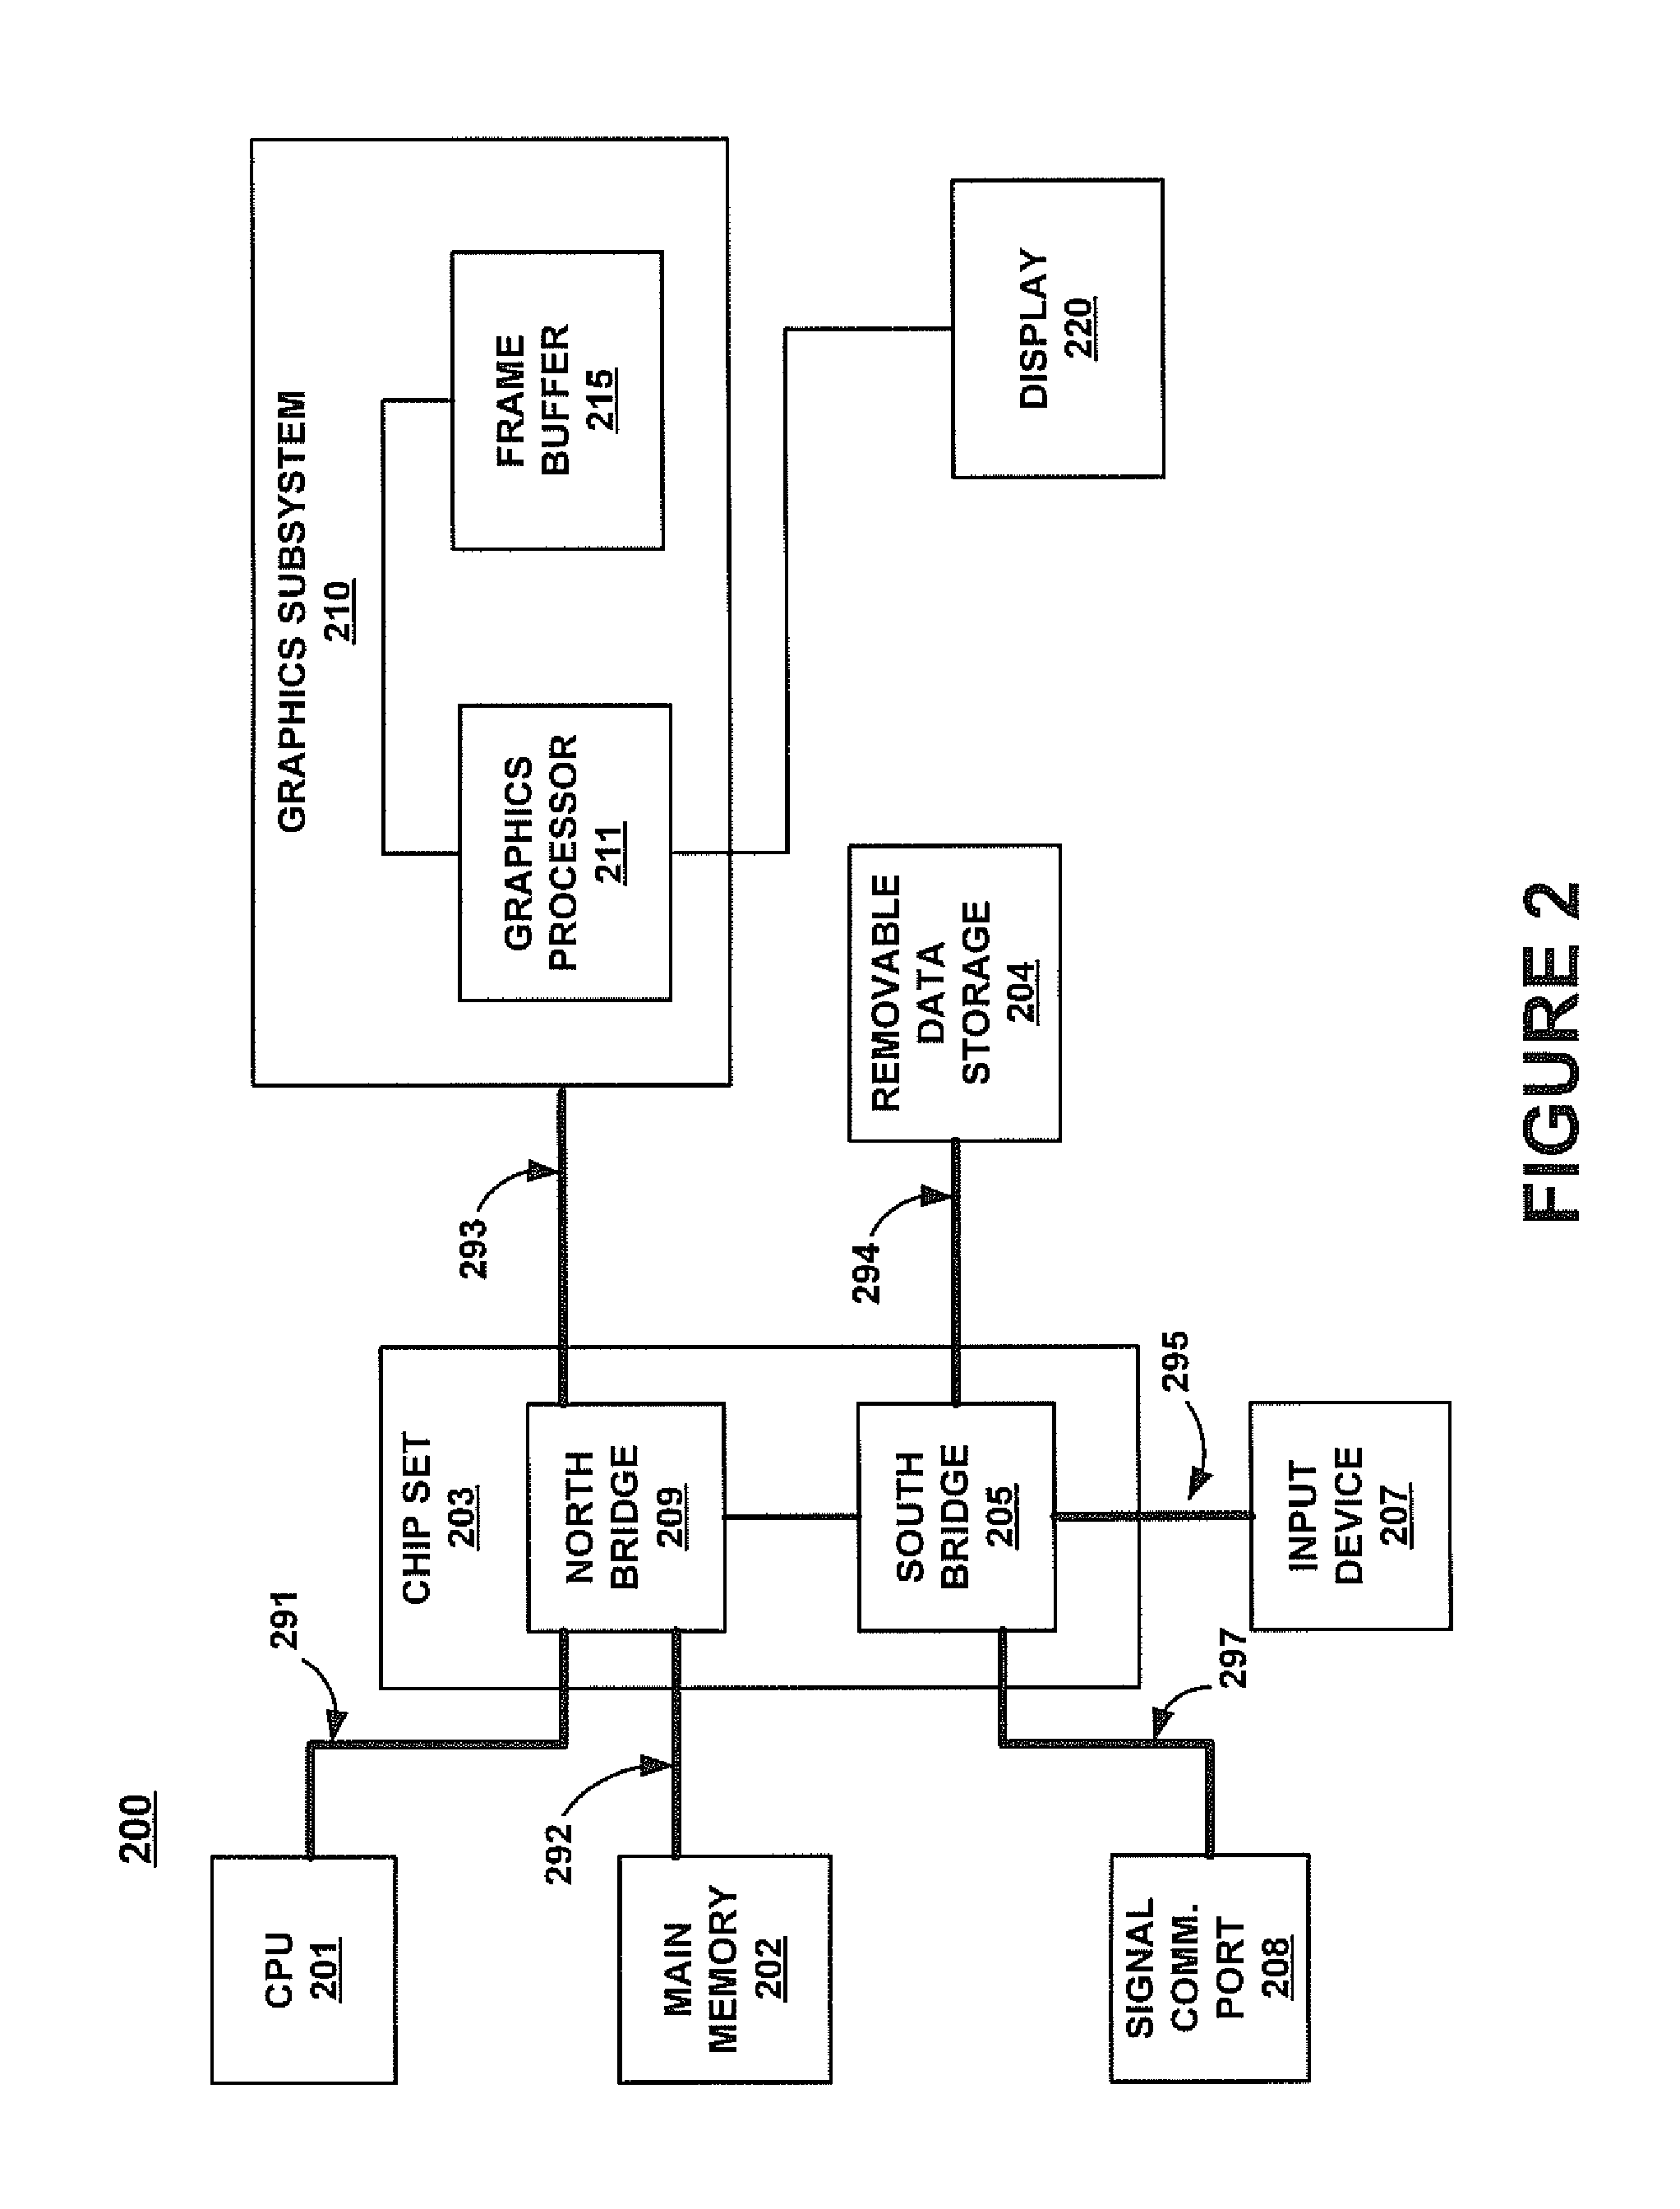 Patent Us 8775112 B2 Most Versatile Electronics Simulator In The World Autodesk Circuits